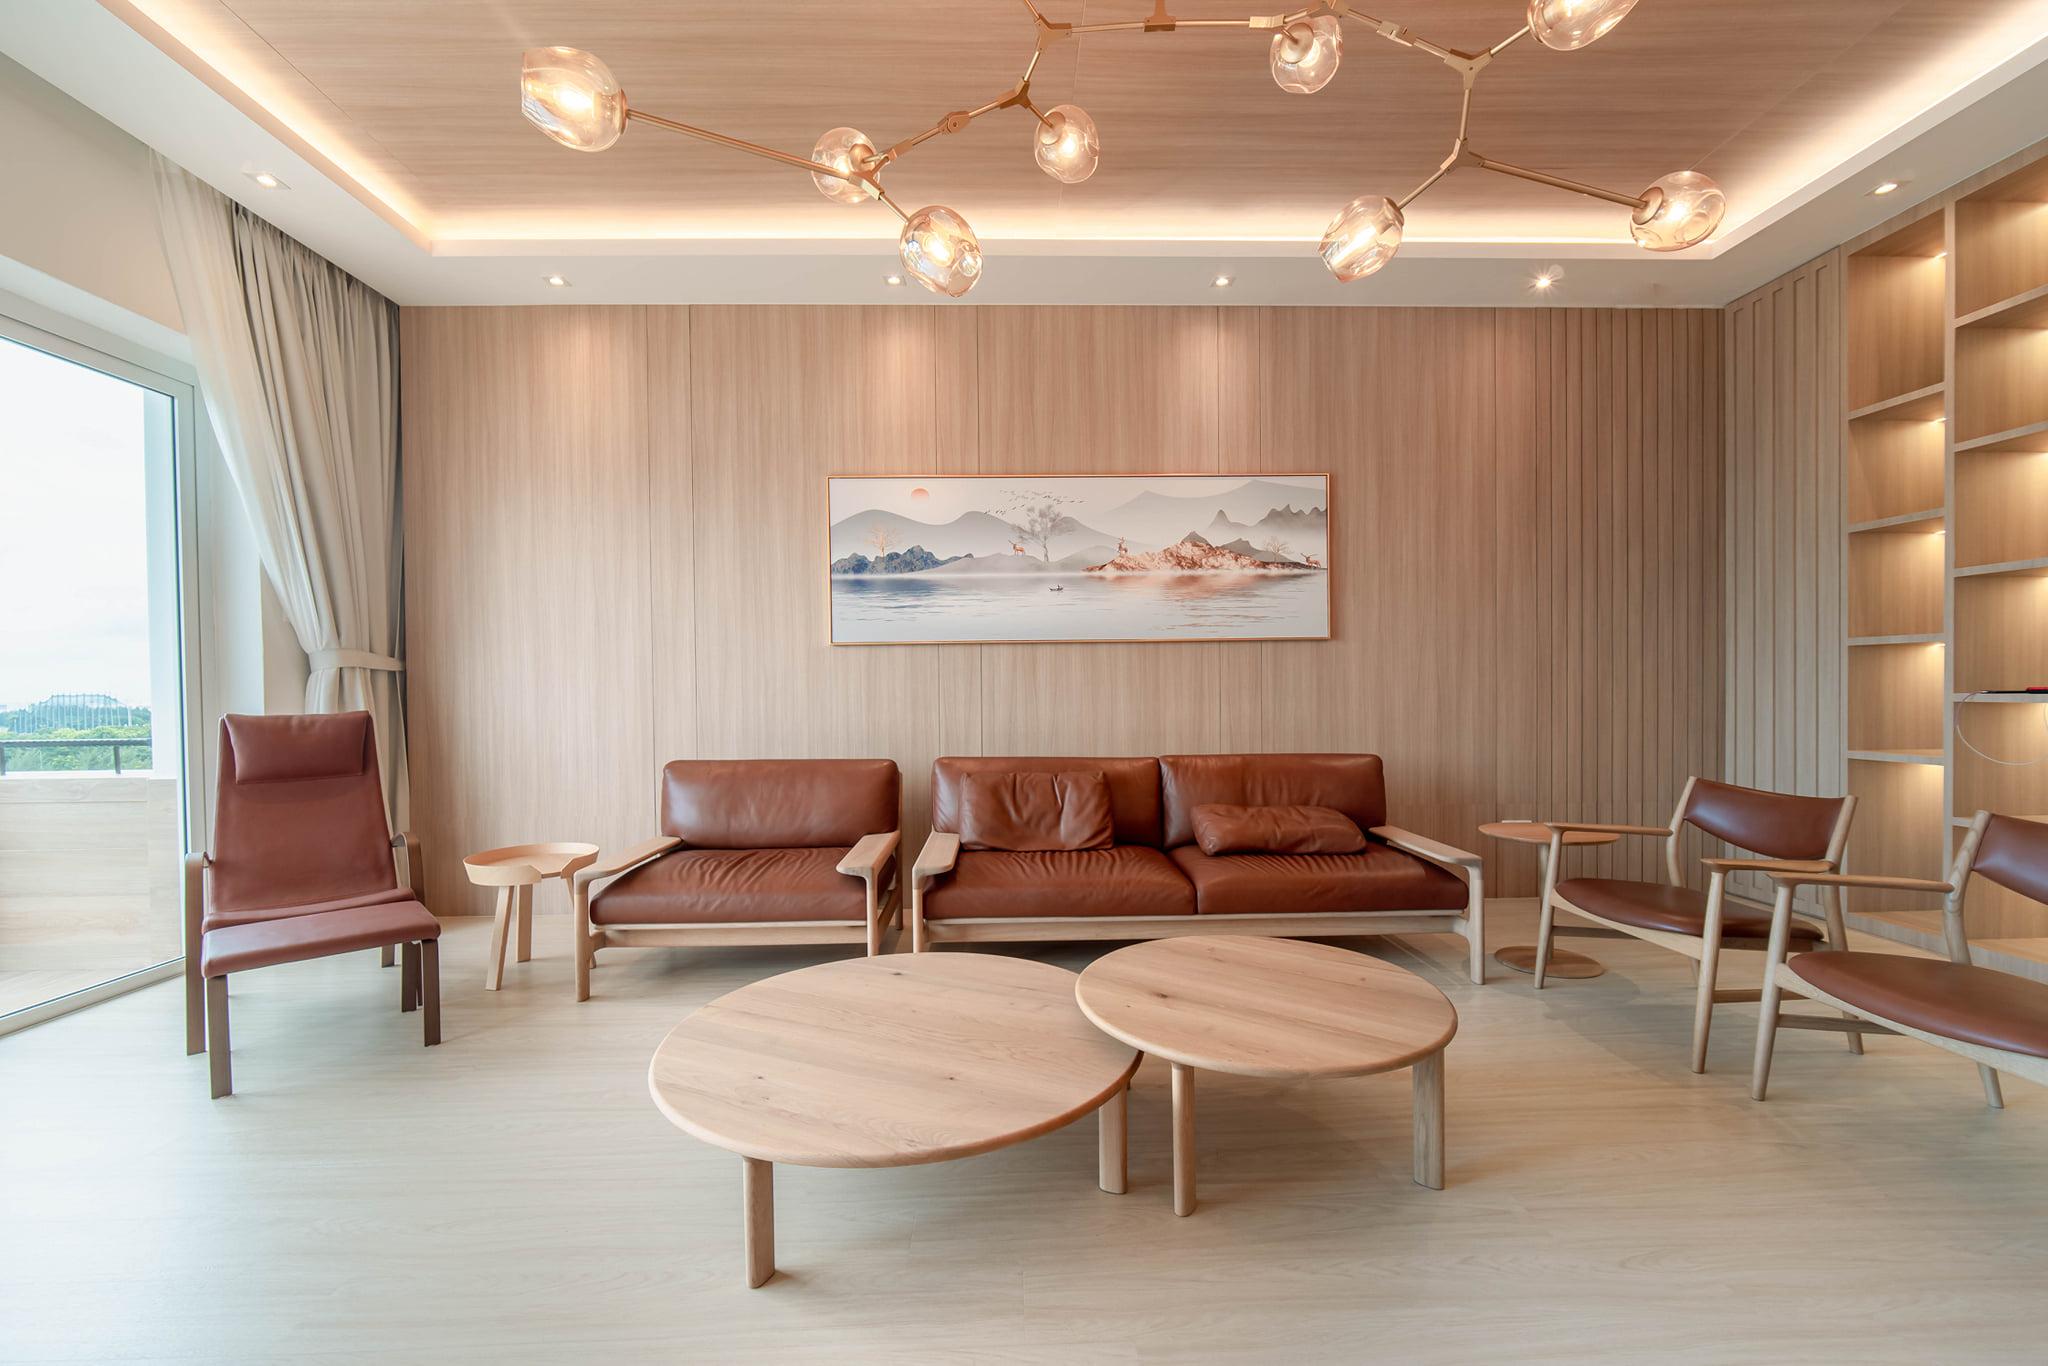 Costa Rhu Condominium Interior Design by JJ Yang + Jimmy Liew